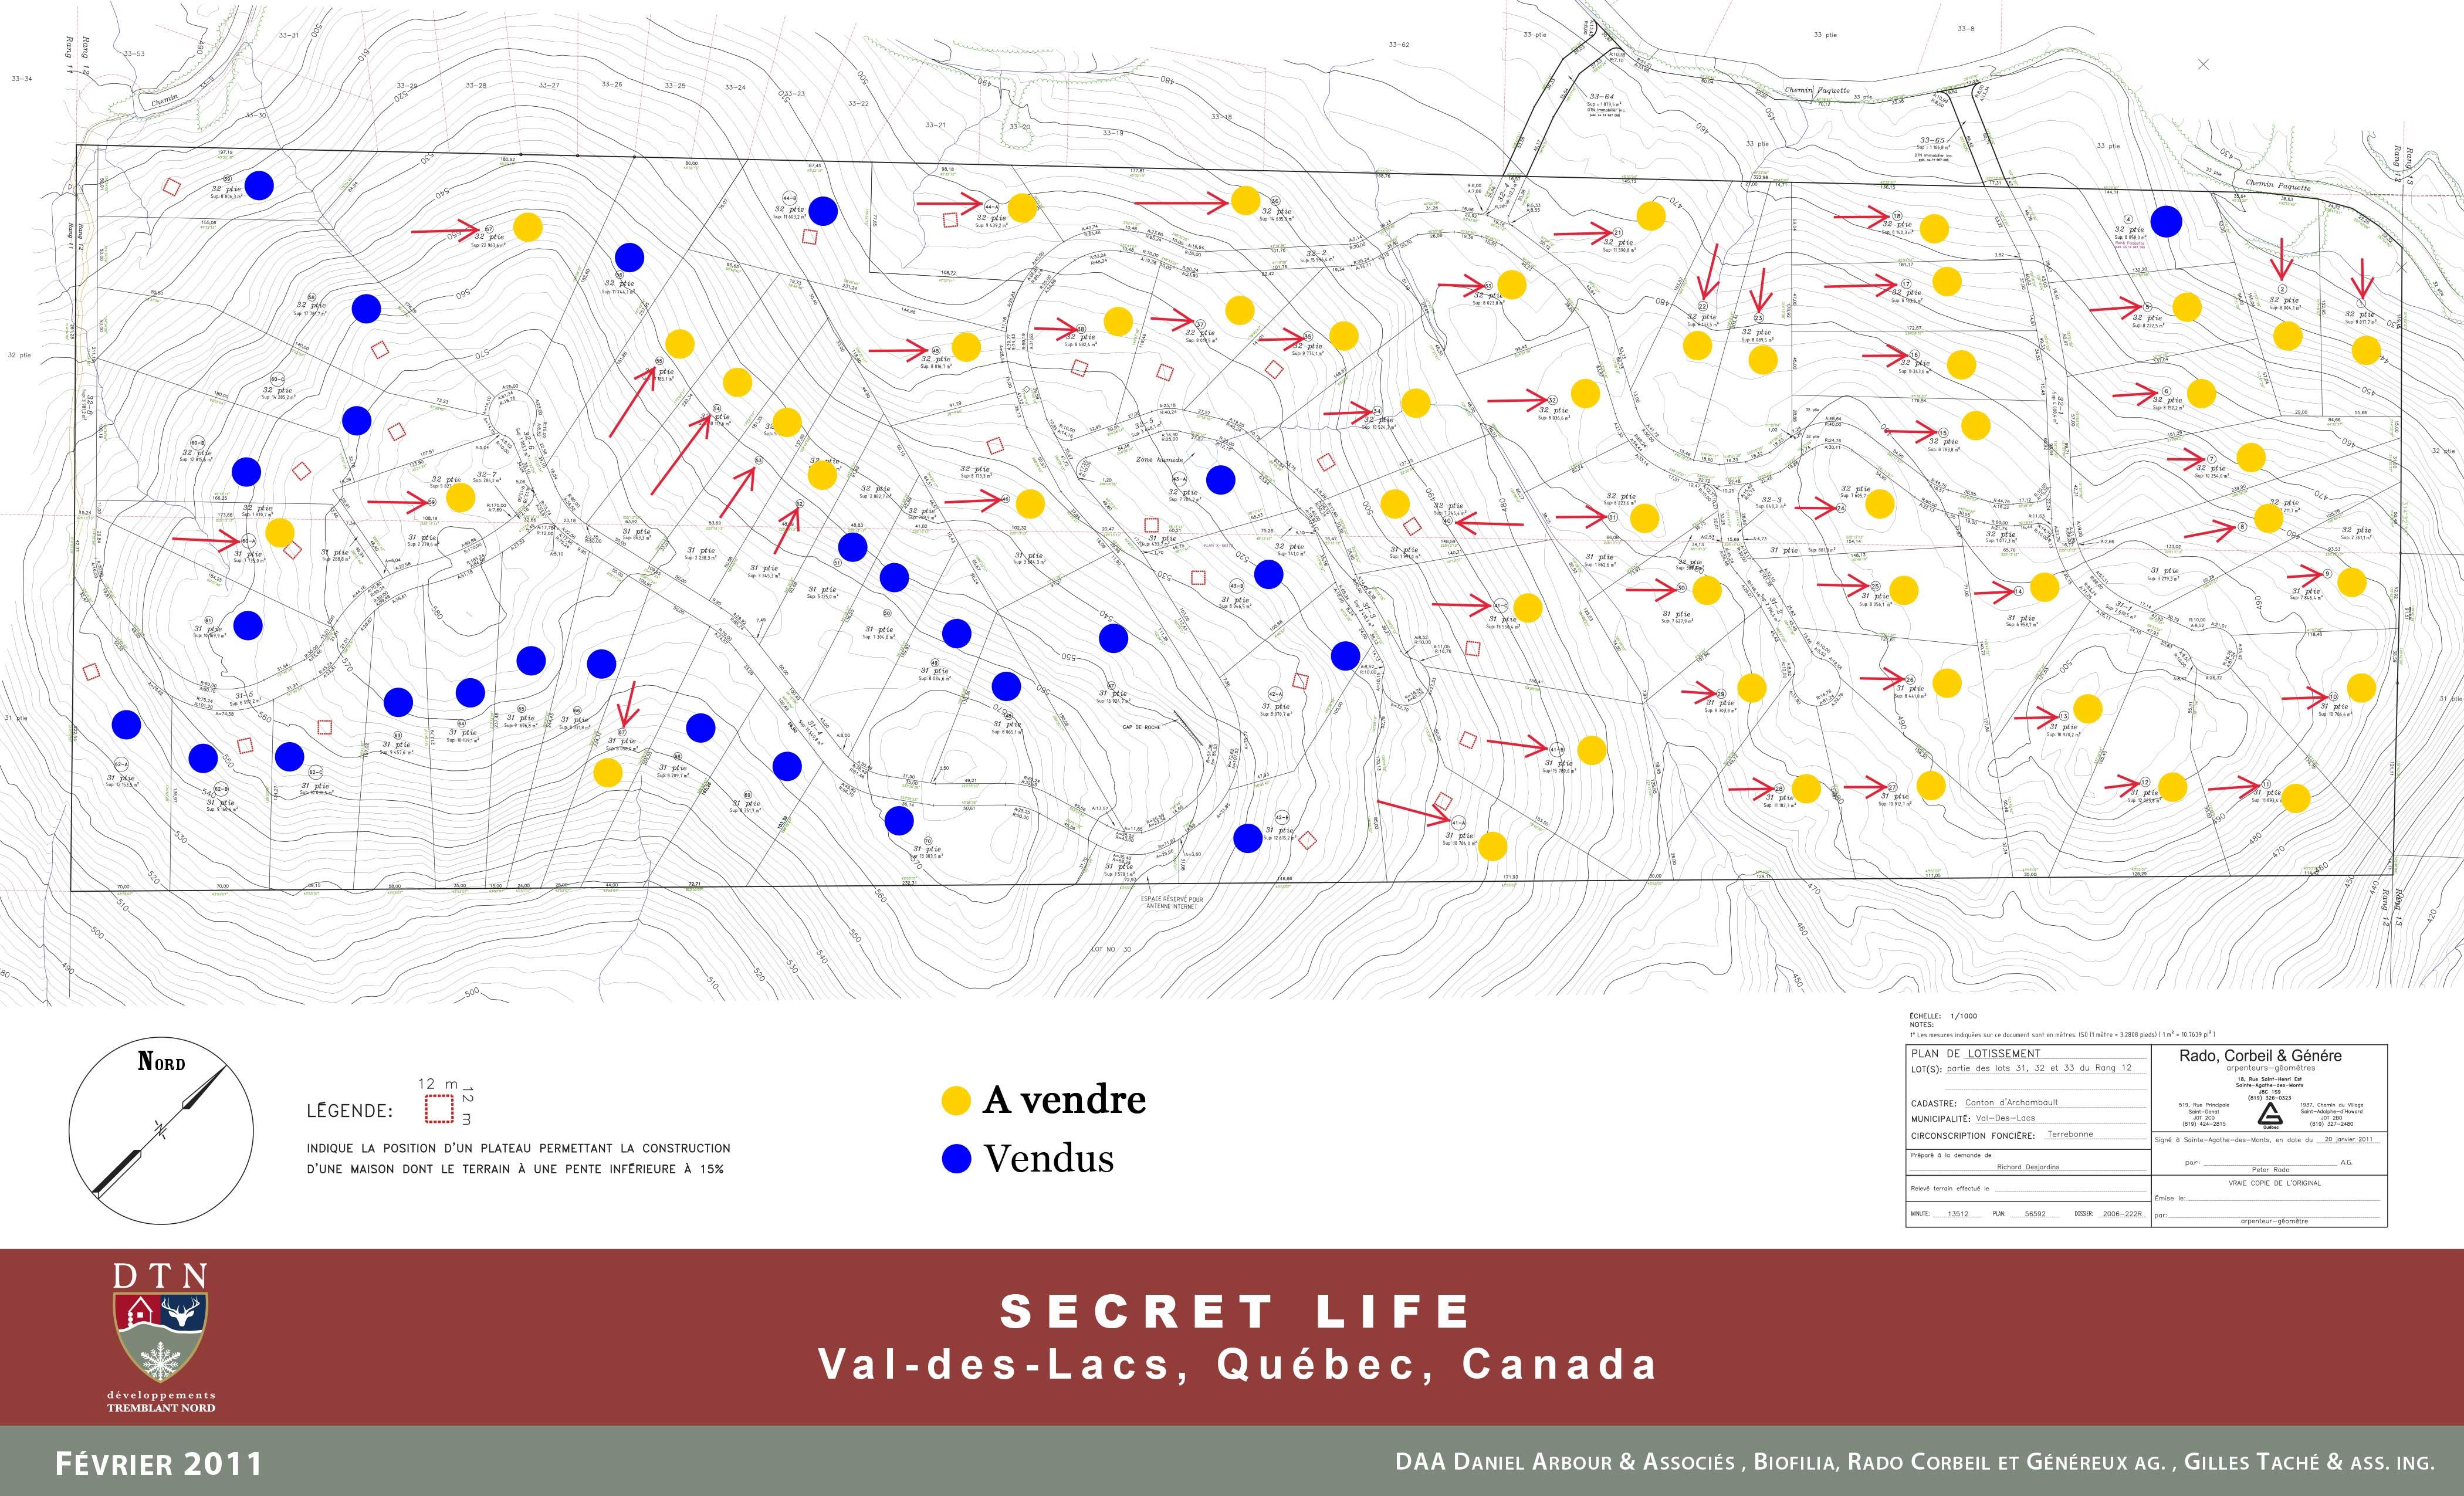 Secret-Life-carte-md